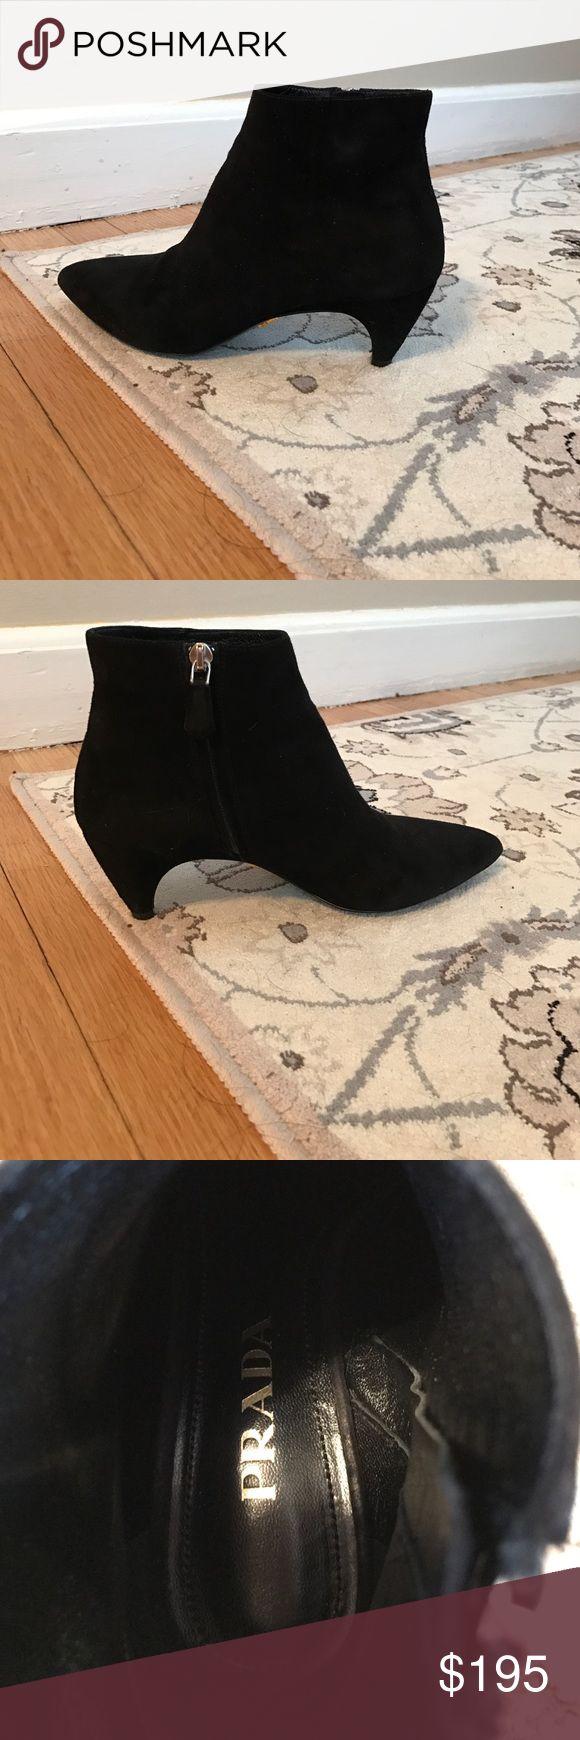 Prada black suede kitten heel ankle boot Prada black suede kitten heel ankle boot, gently worn Prada Shoes Ankle Boots & Booties